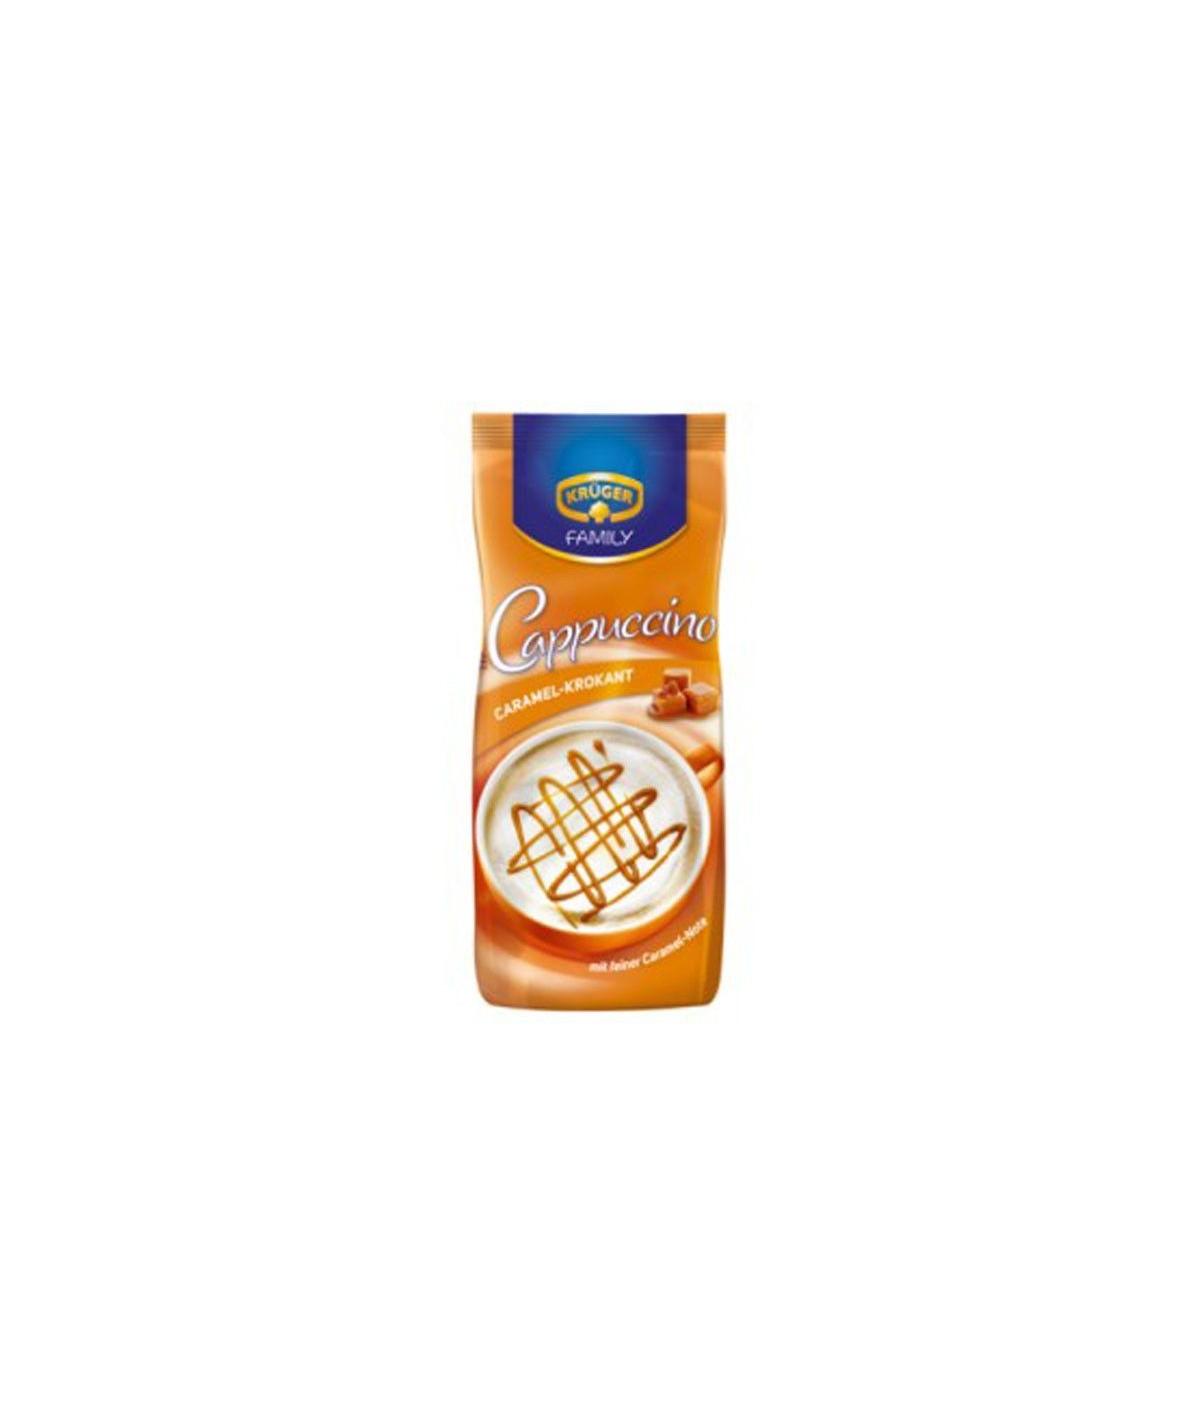 Family Cappuccino Caramel-Krokant Krüger 500 g